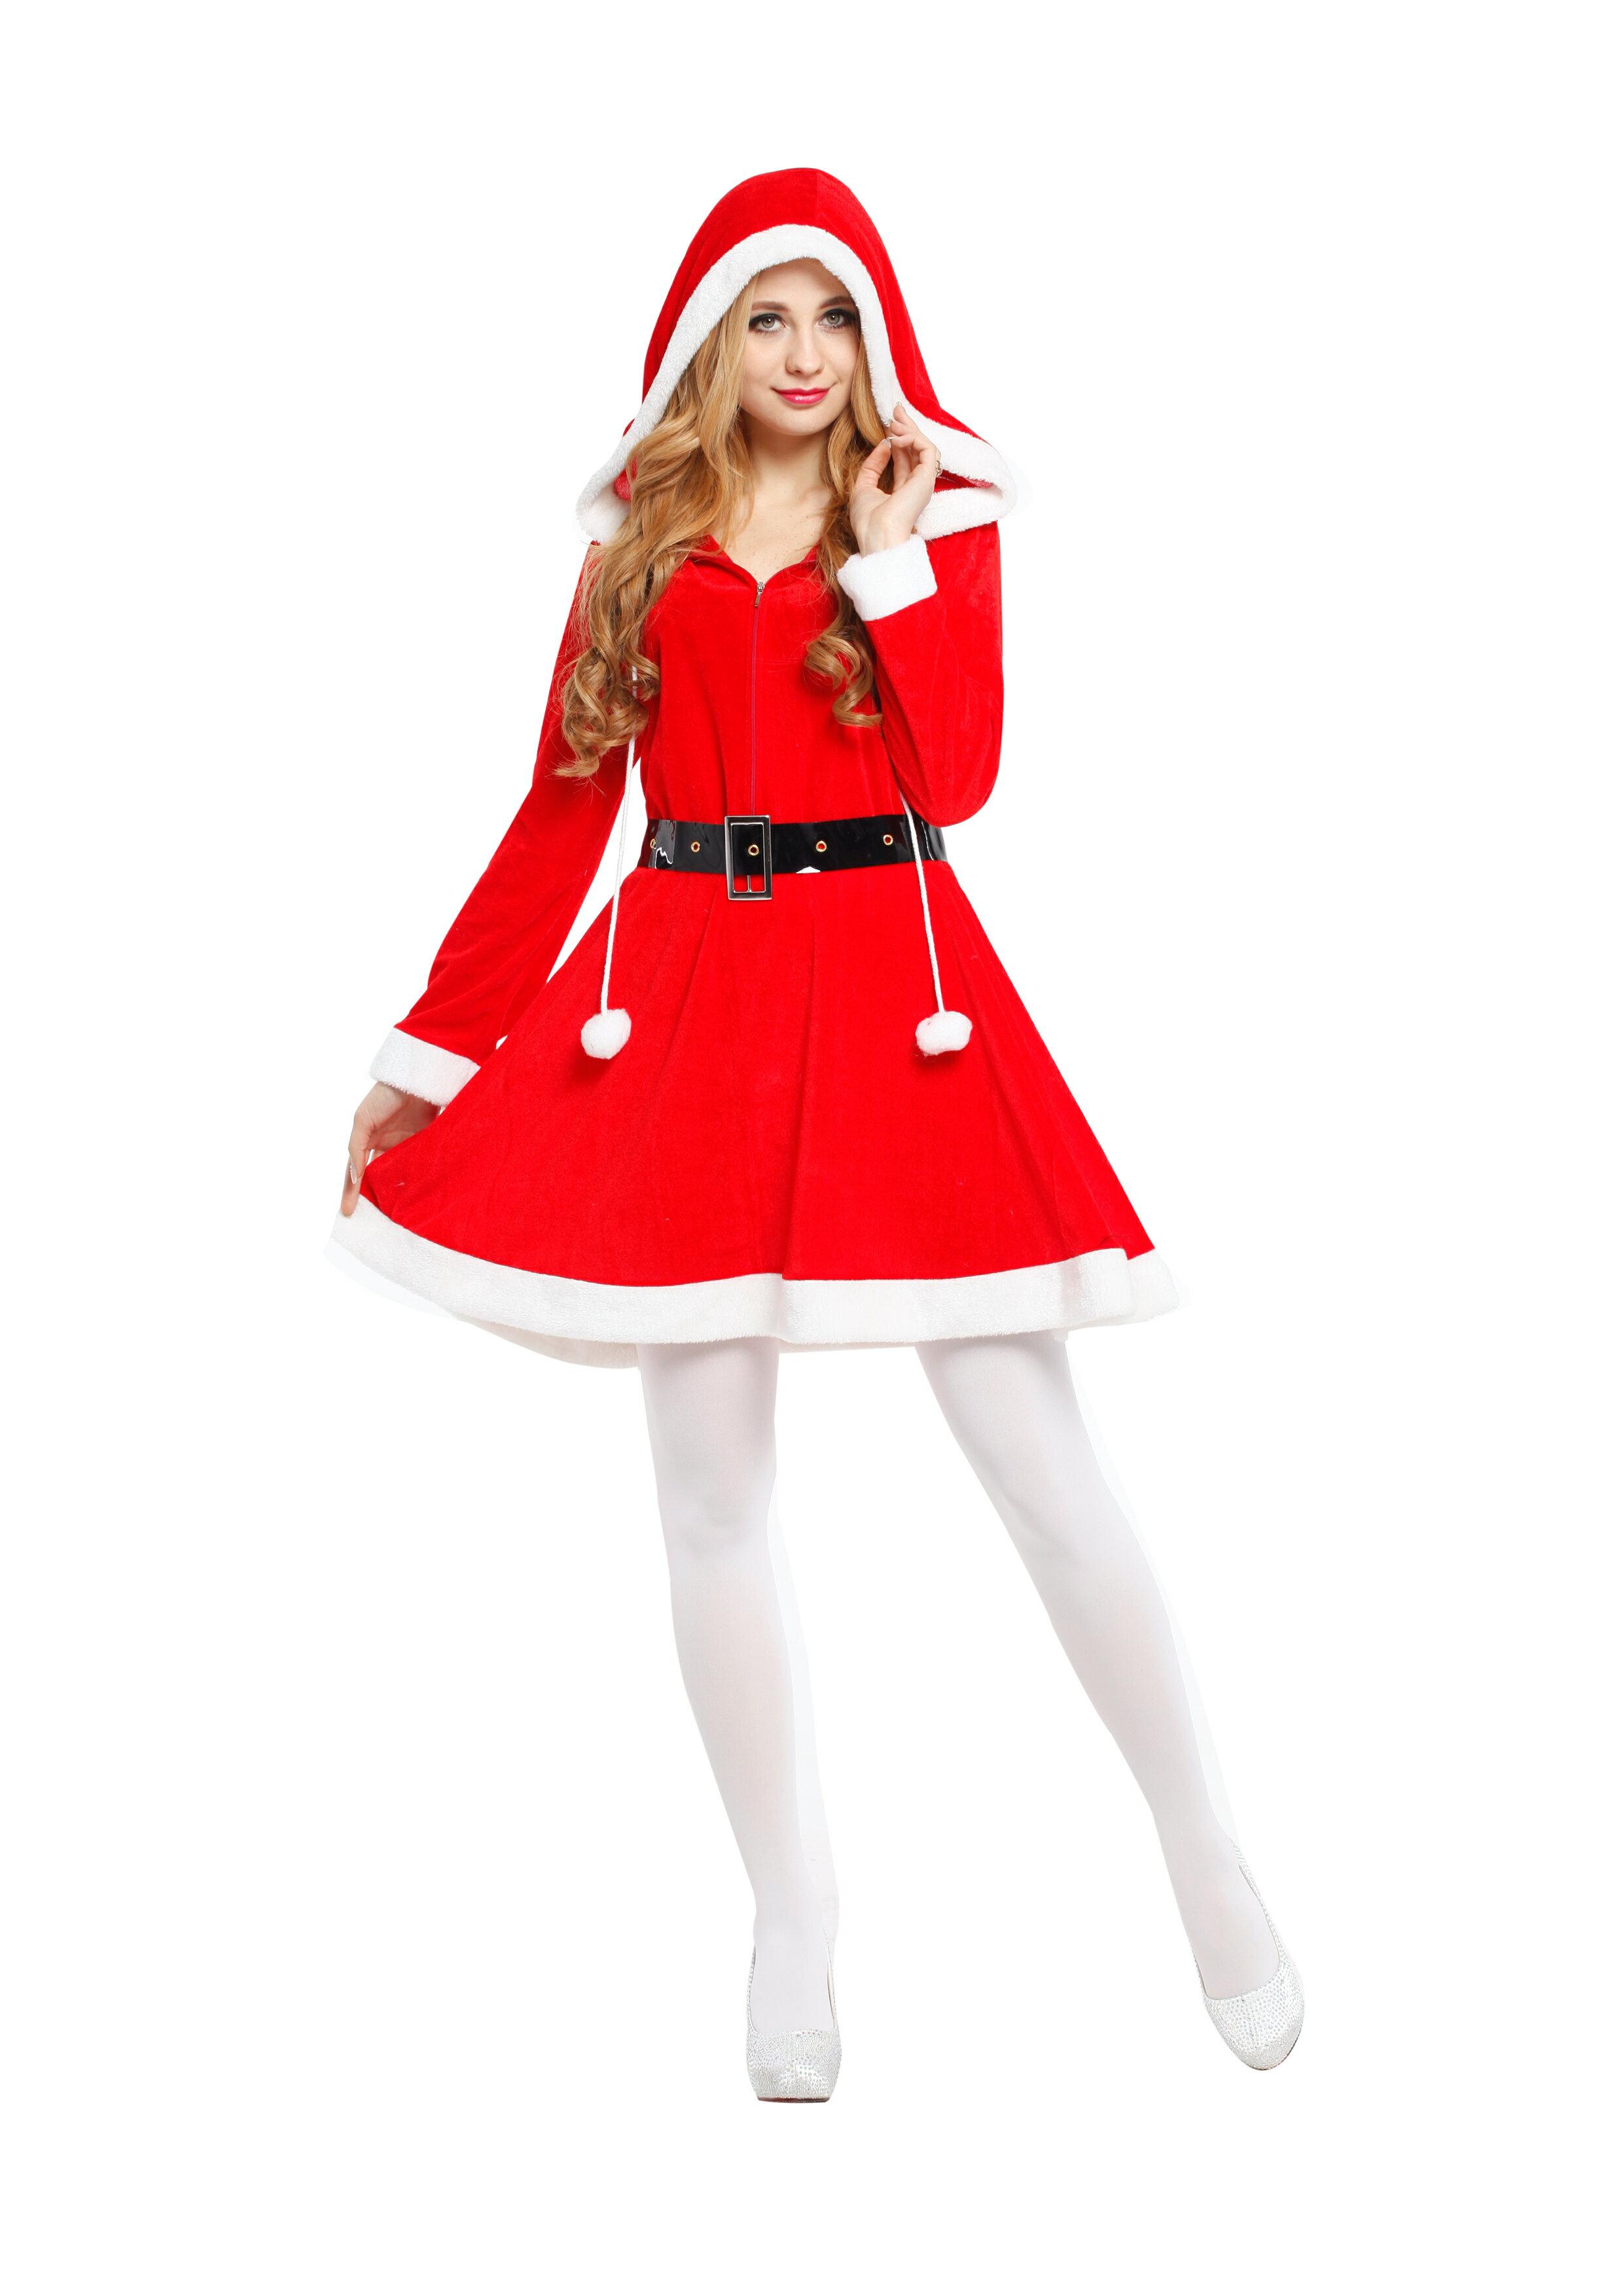 X射线【X380025】 亮丽圣诞服, 舞会/尾牙/万圣/圣诞/大人变装/cosplay/表演/摄影/写真/话剧/童话/性感/交换礼物